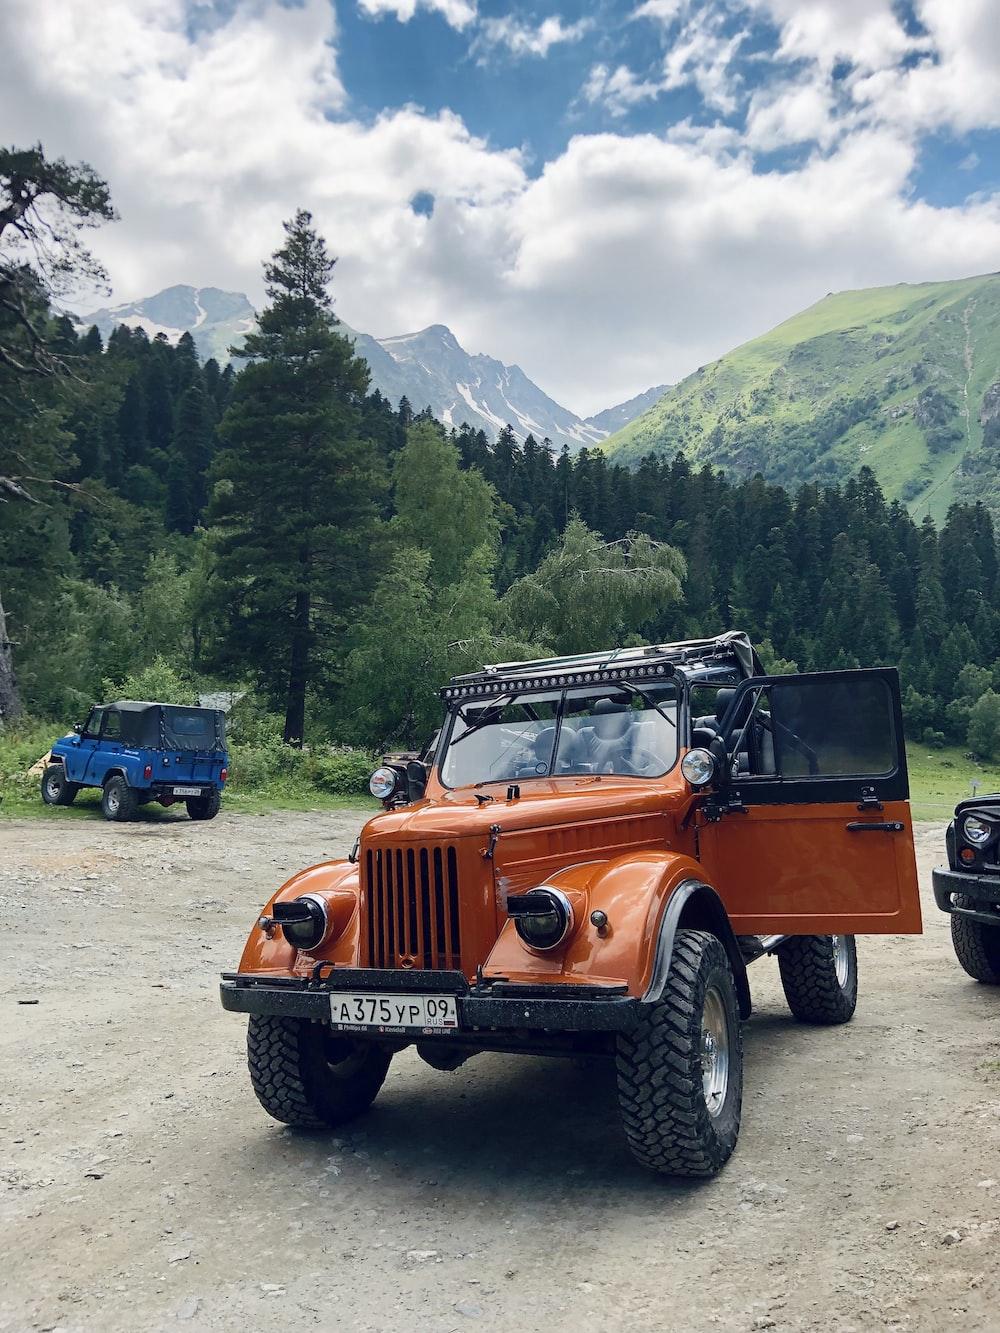 orange jeep wrangler on dirt road near green trees during daytime